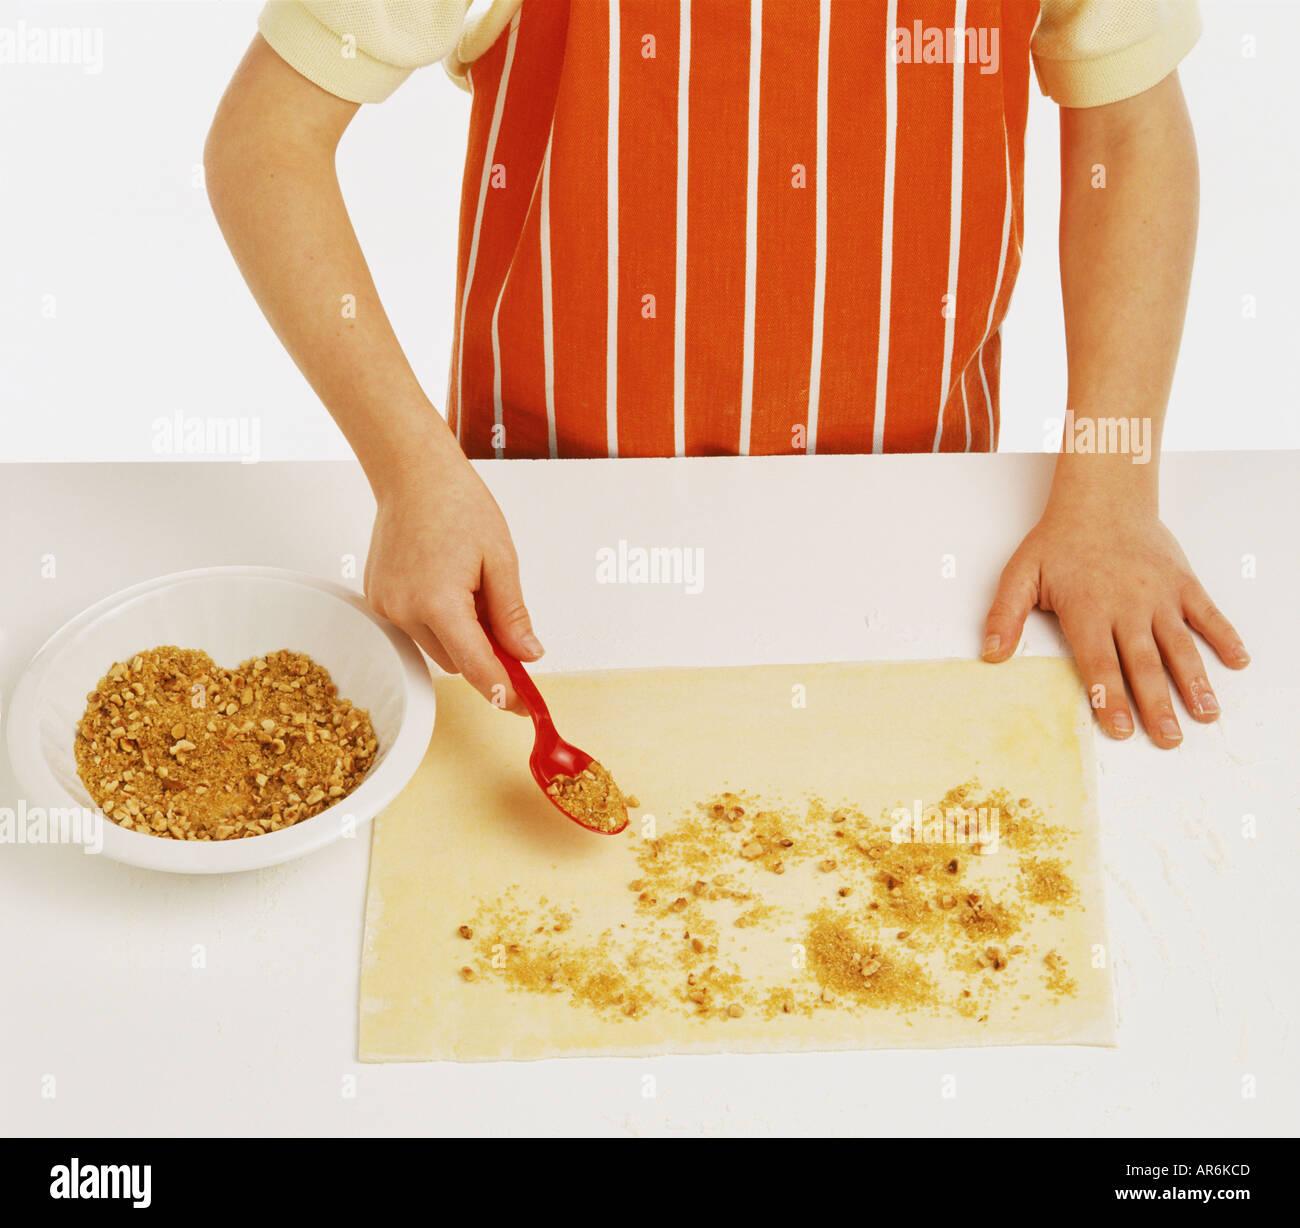 White apron food - Hand Model Wearing And Orange And White Apron Sprinkling Chopped Hazelnuts